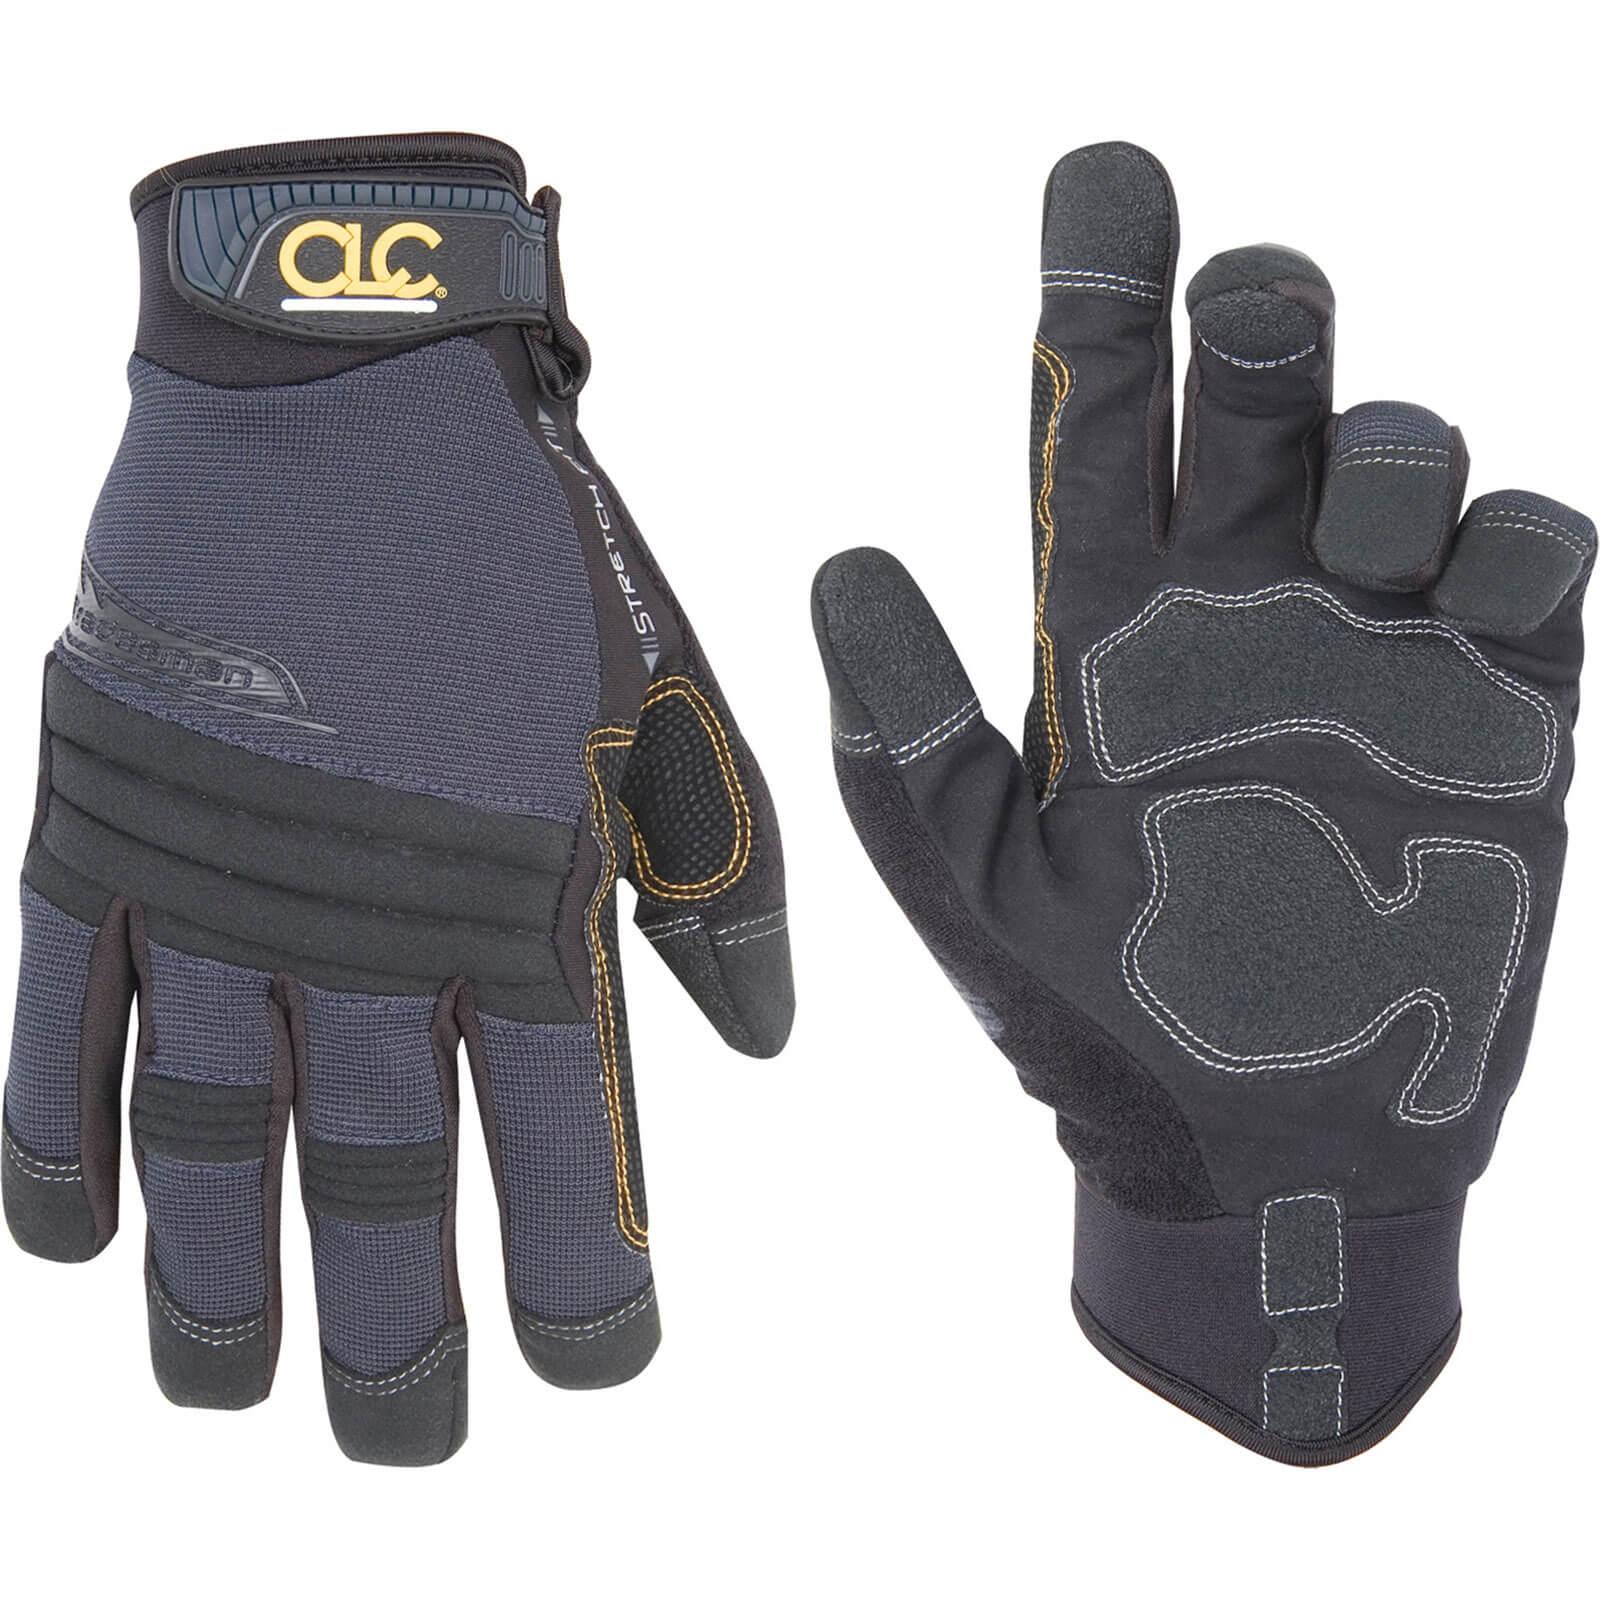 Kunys Tradesman Flex Grip Gloves M